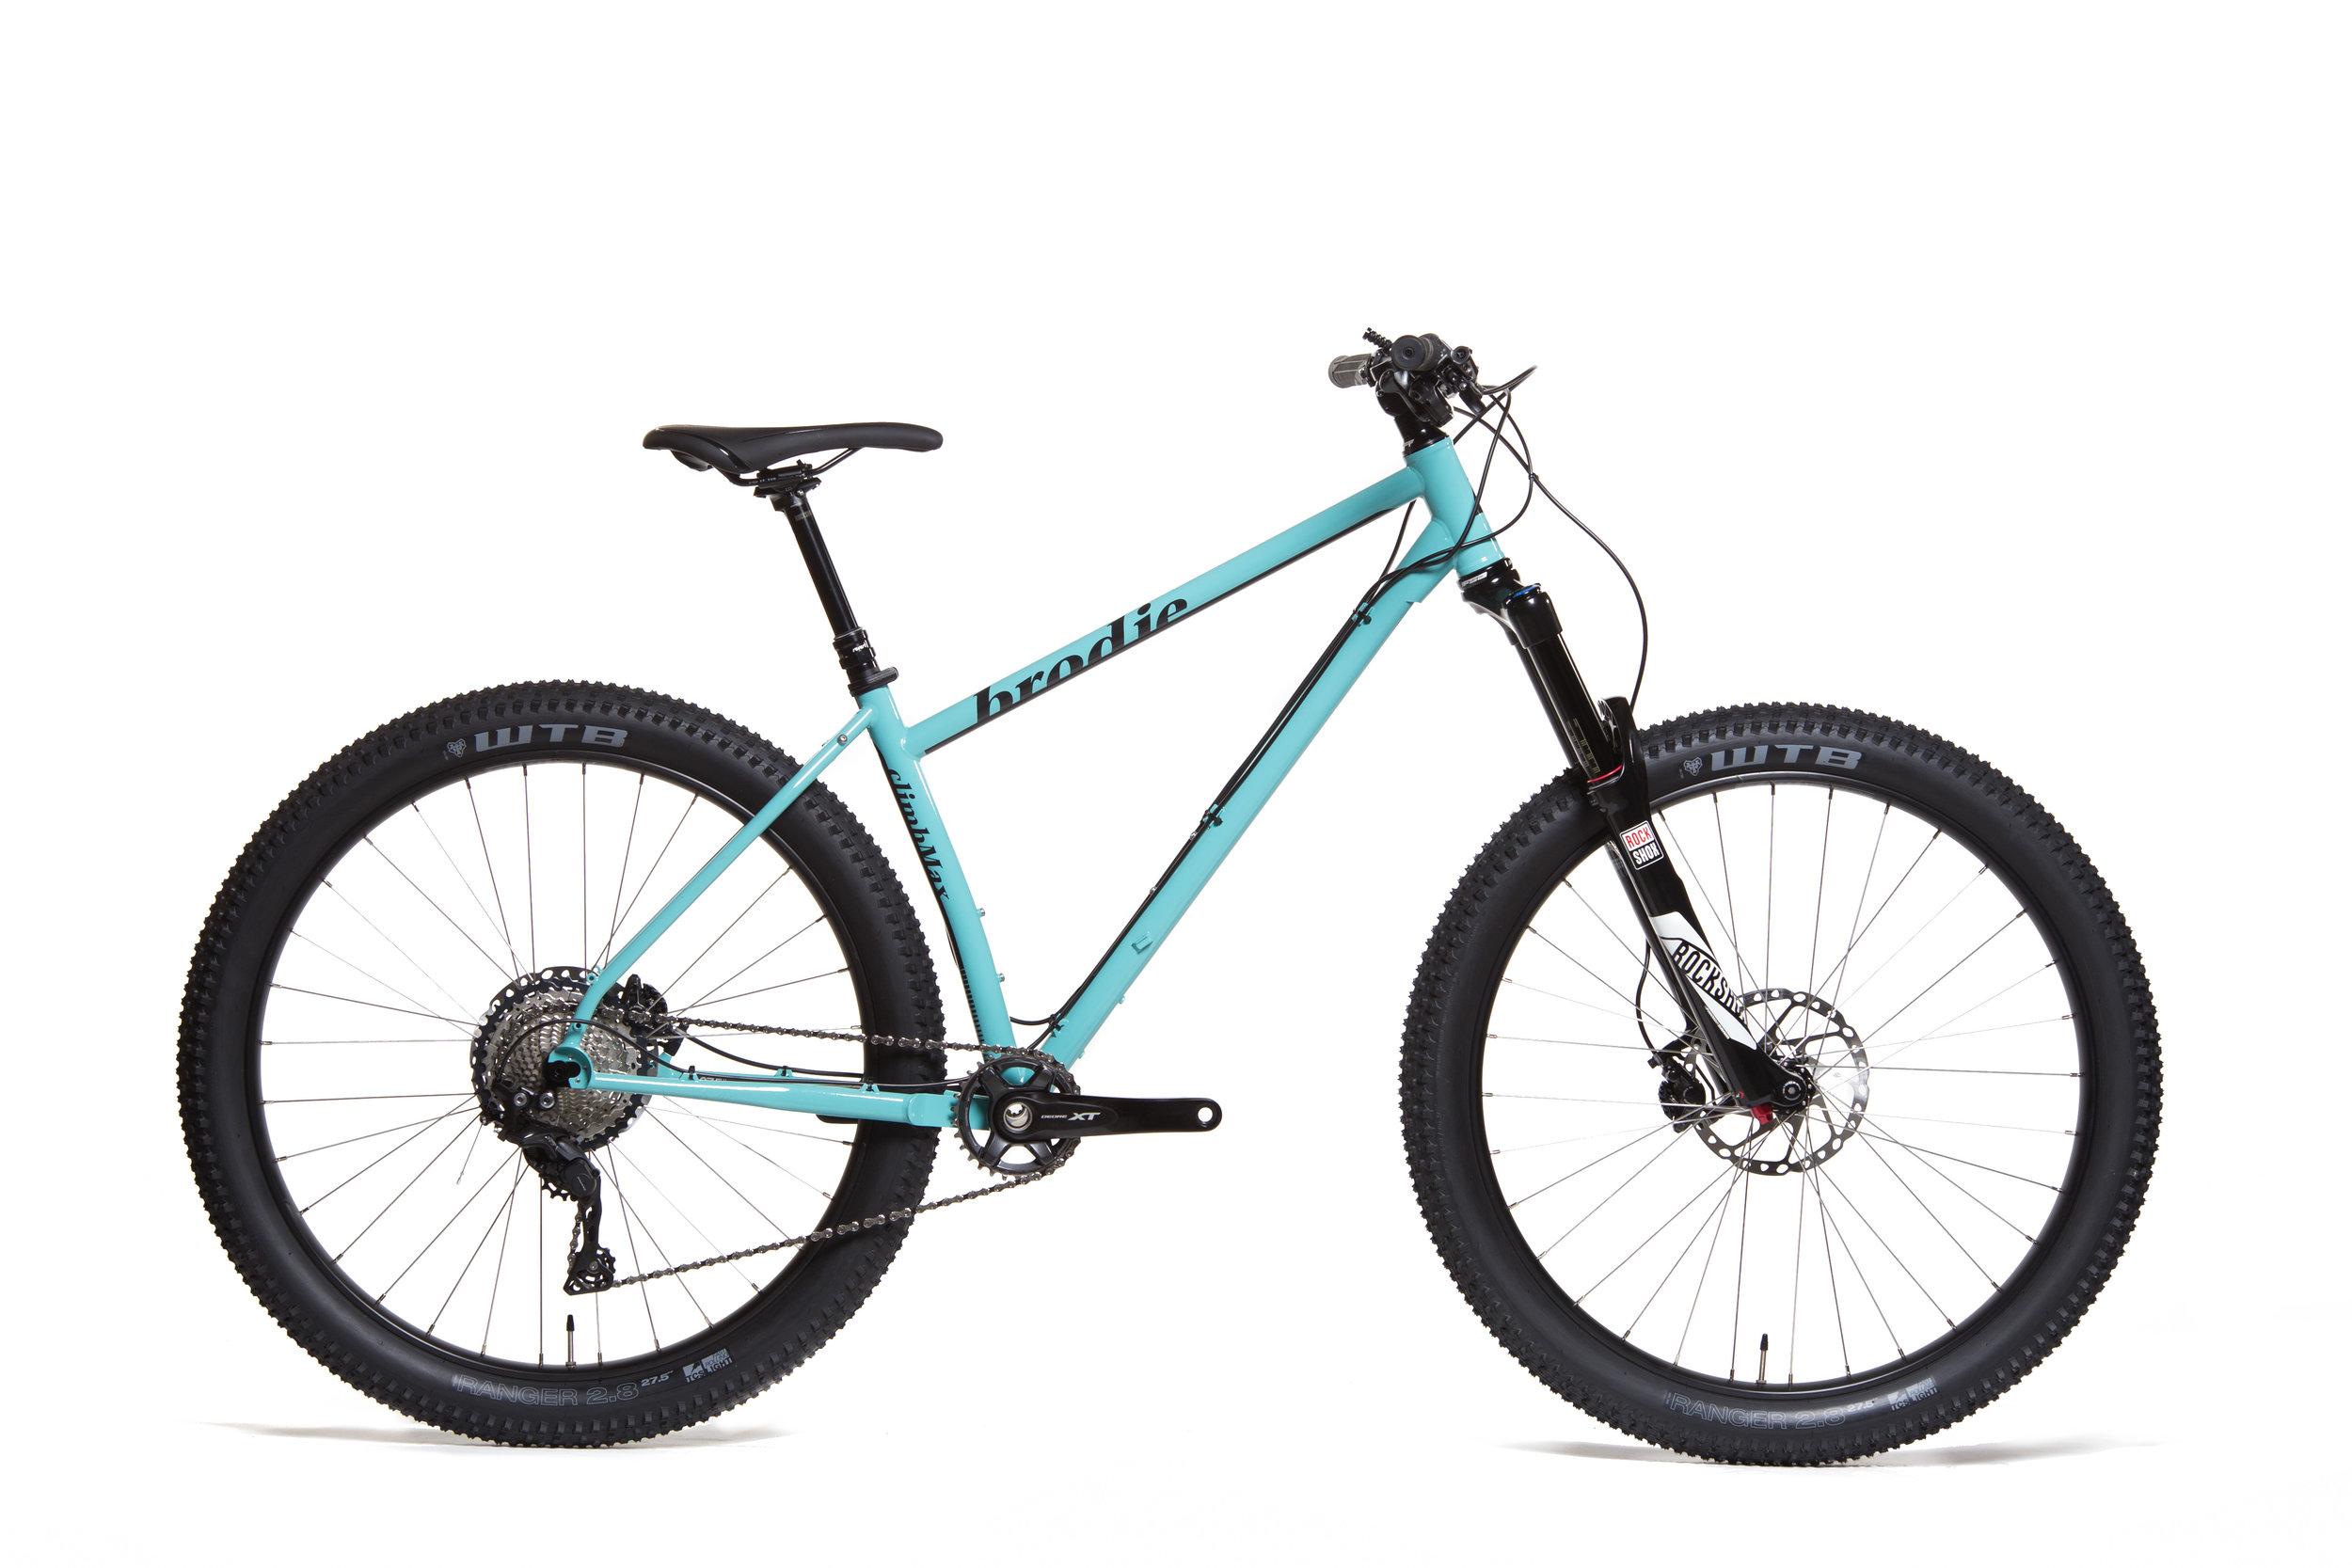 ClimbMax SE - $3999